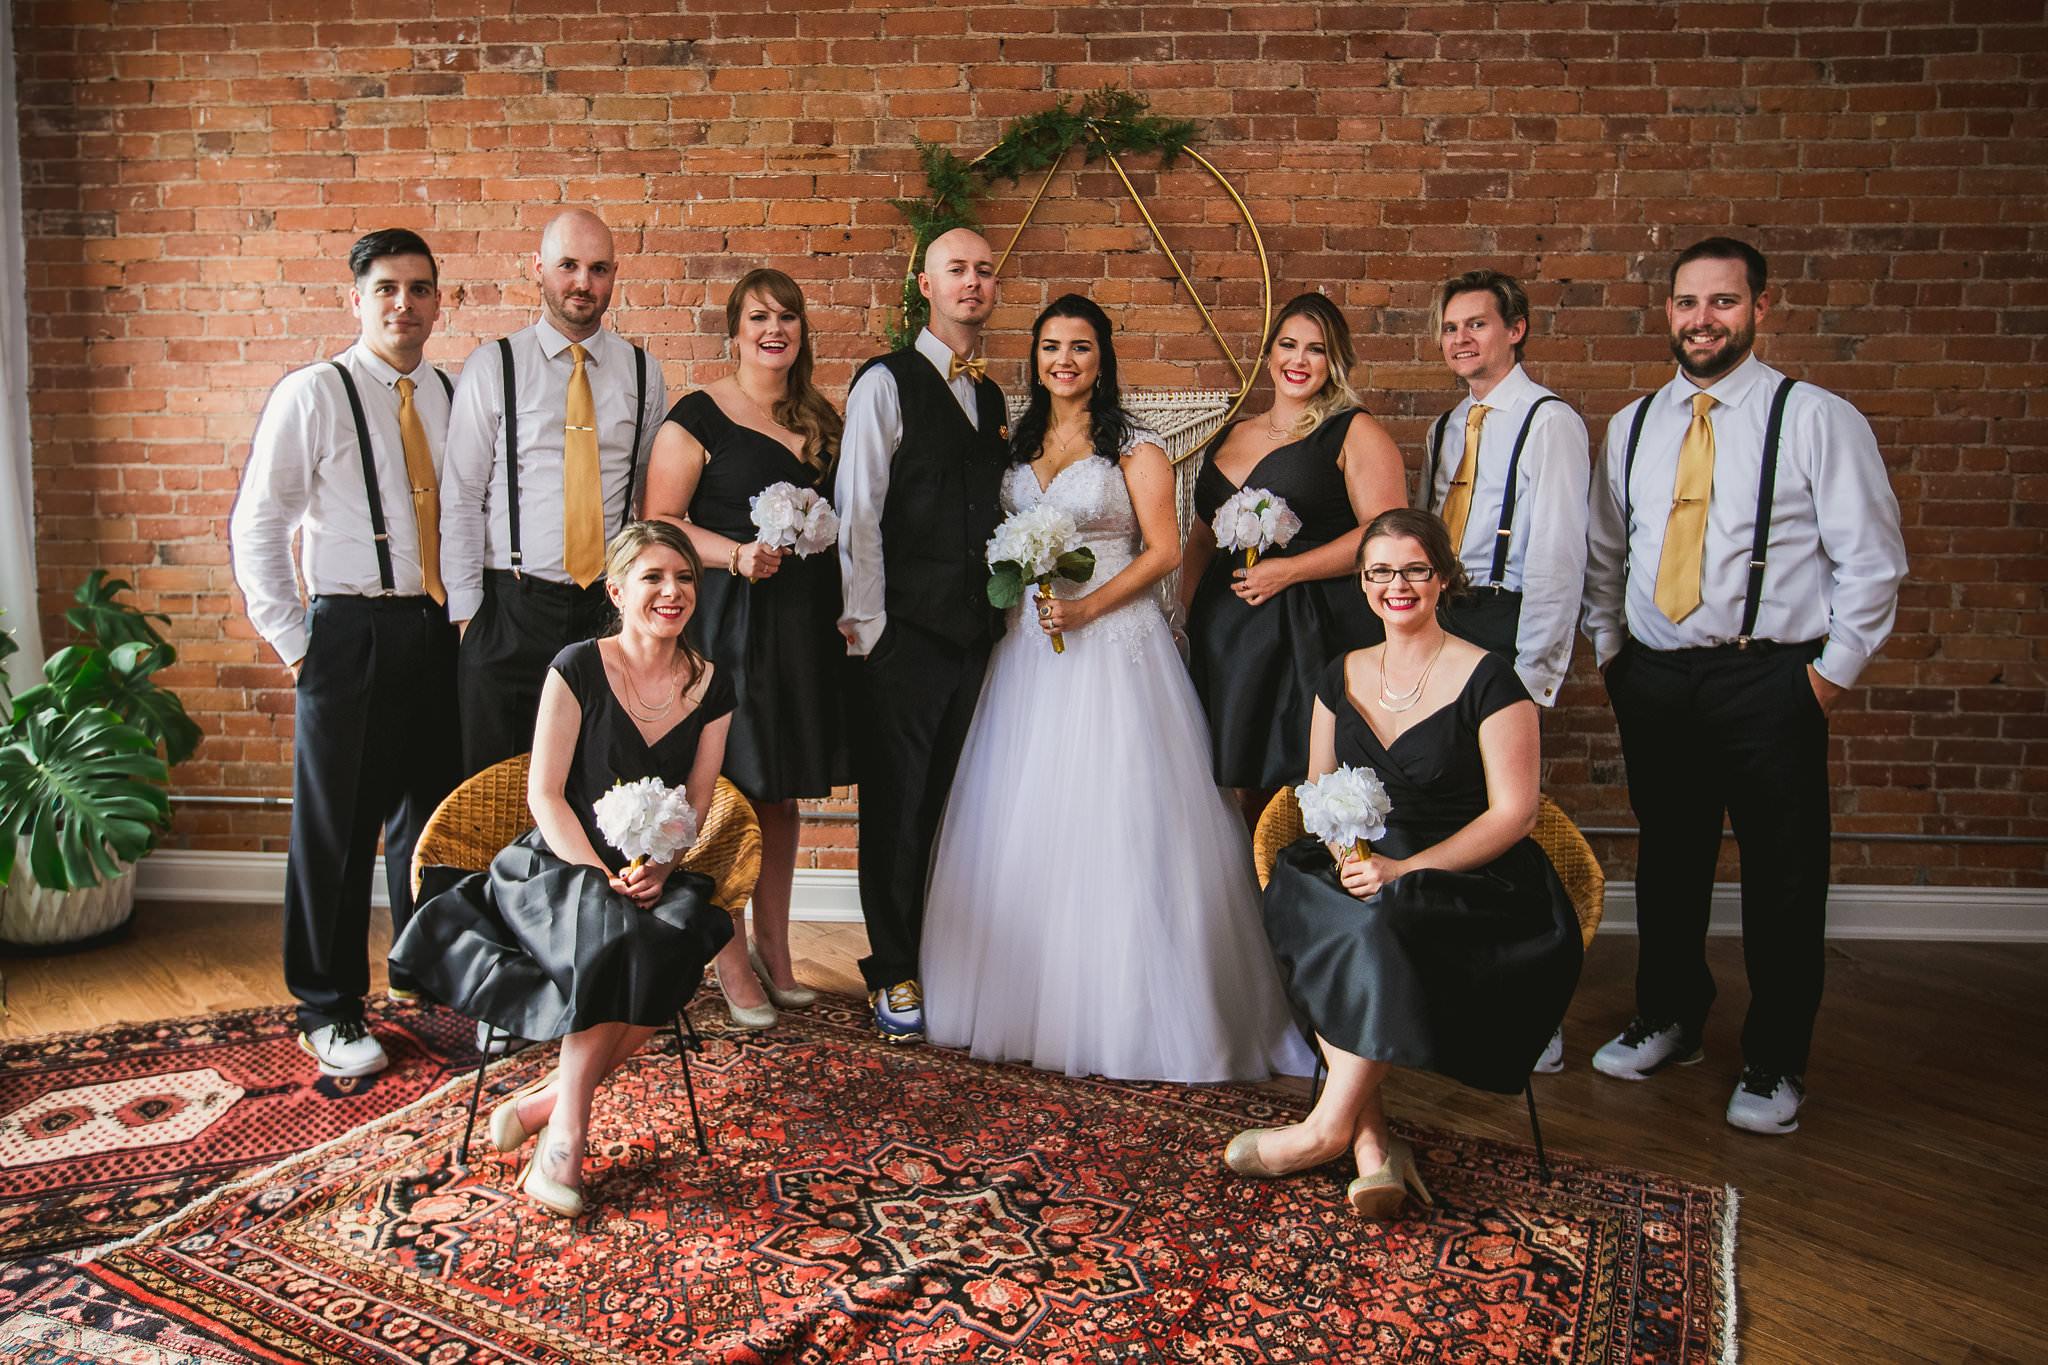 Kristen Adam Kindred Loft Whitby Wedding Photos 270 - Durham Wedding Photographer: Kindred Loft Wedding Photos